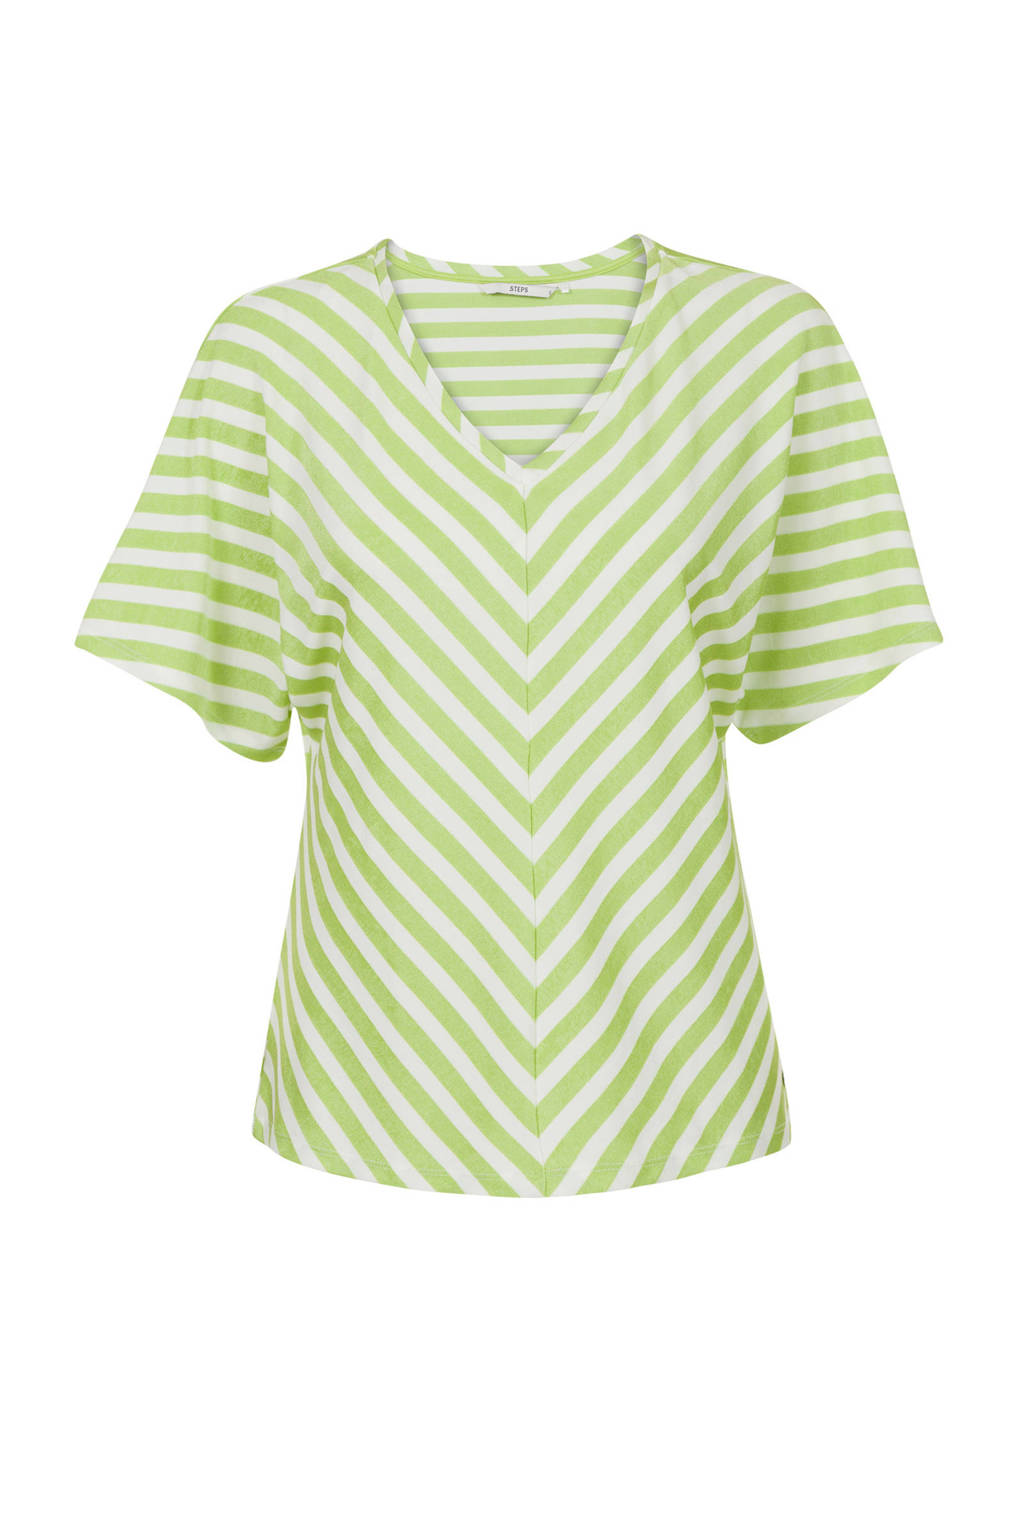 Steps gestreept T-shirt groen/wit, Groen/wit